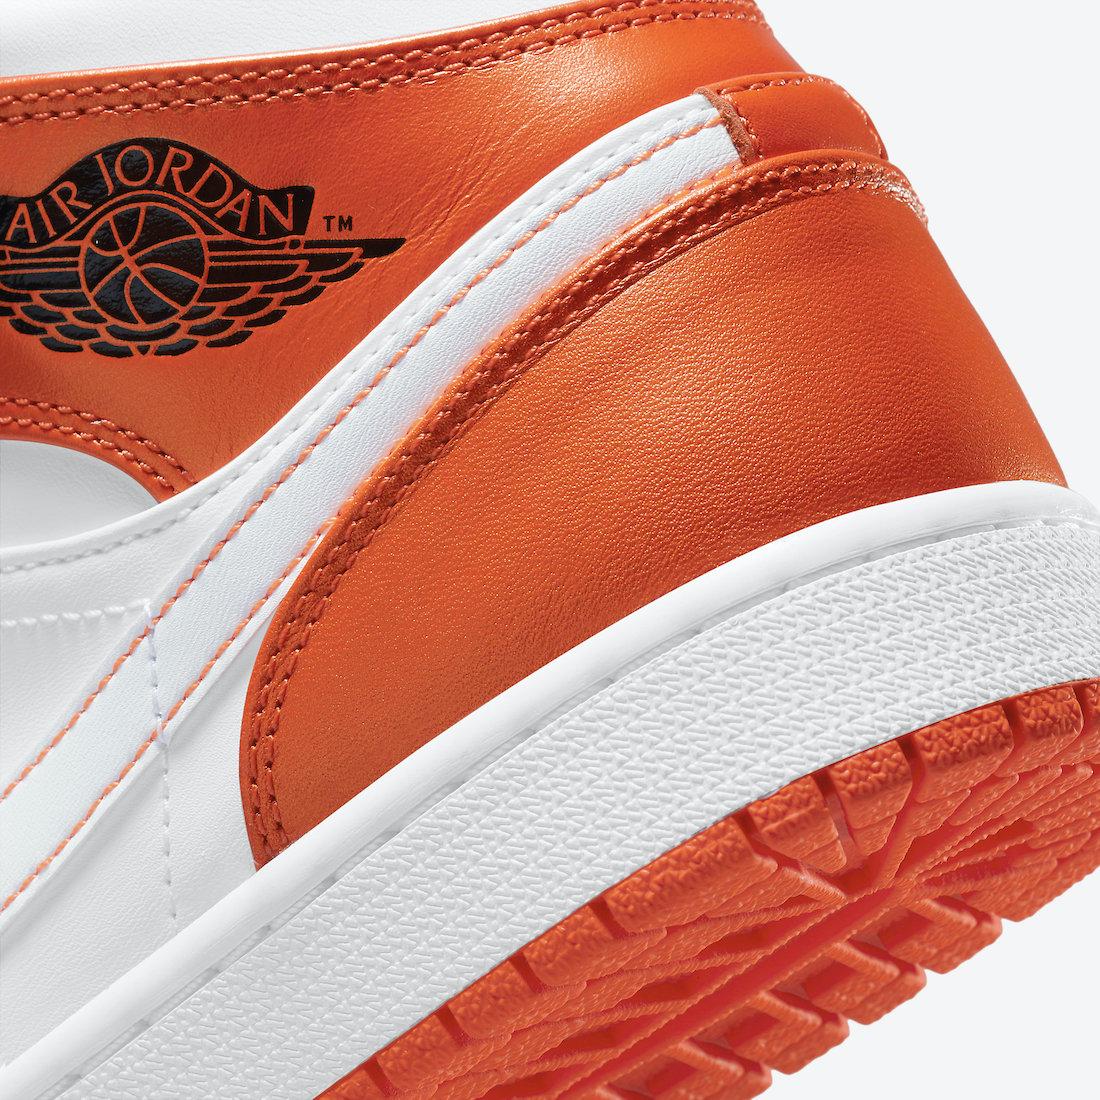 Air-Jordan-1-Mid-White-Orange-DM3531-800-Release-Date-7